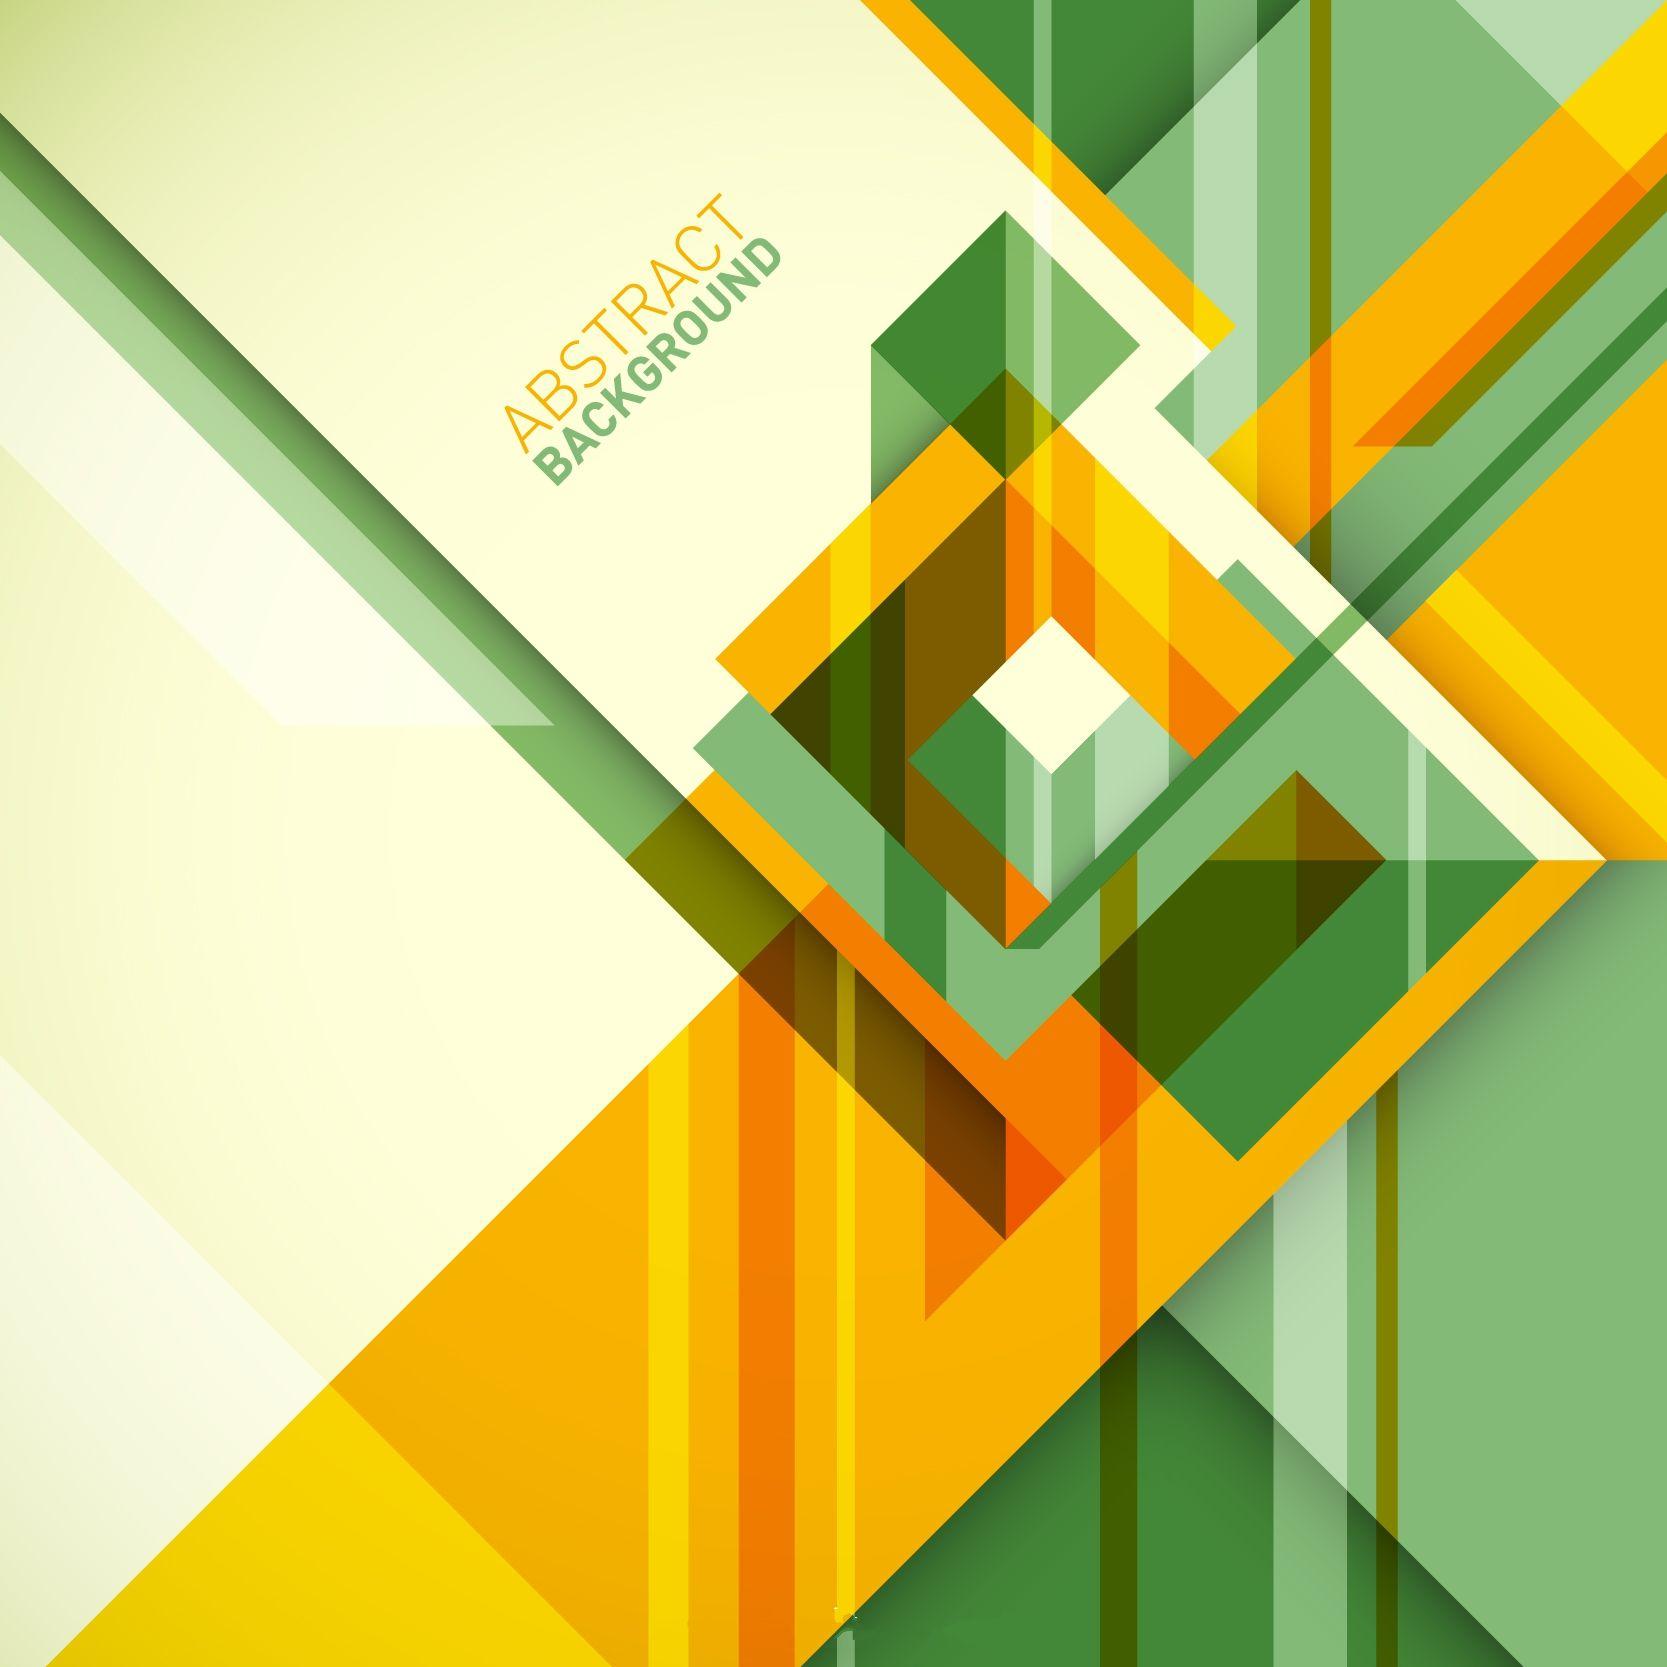 Graphics & Design By Unigeeks